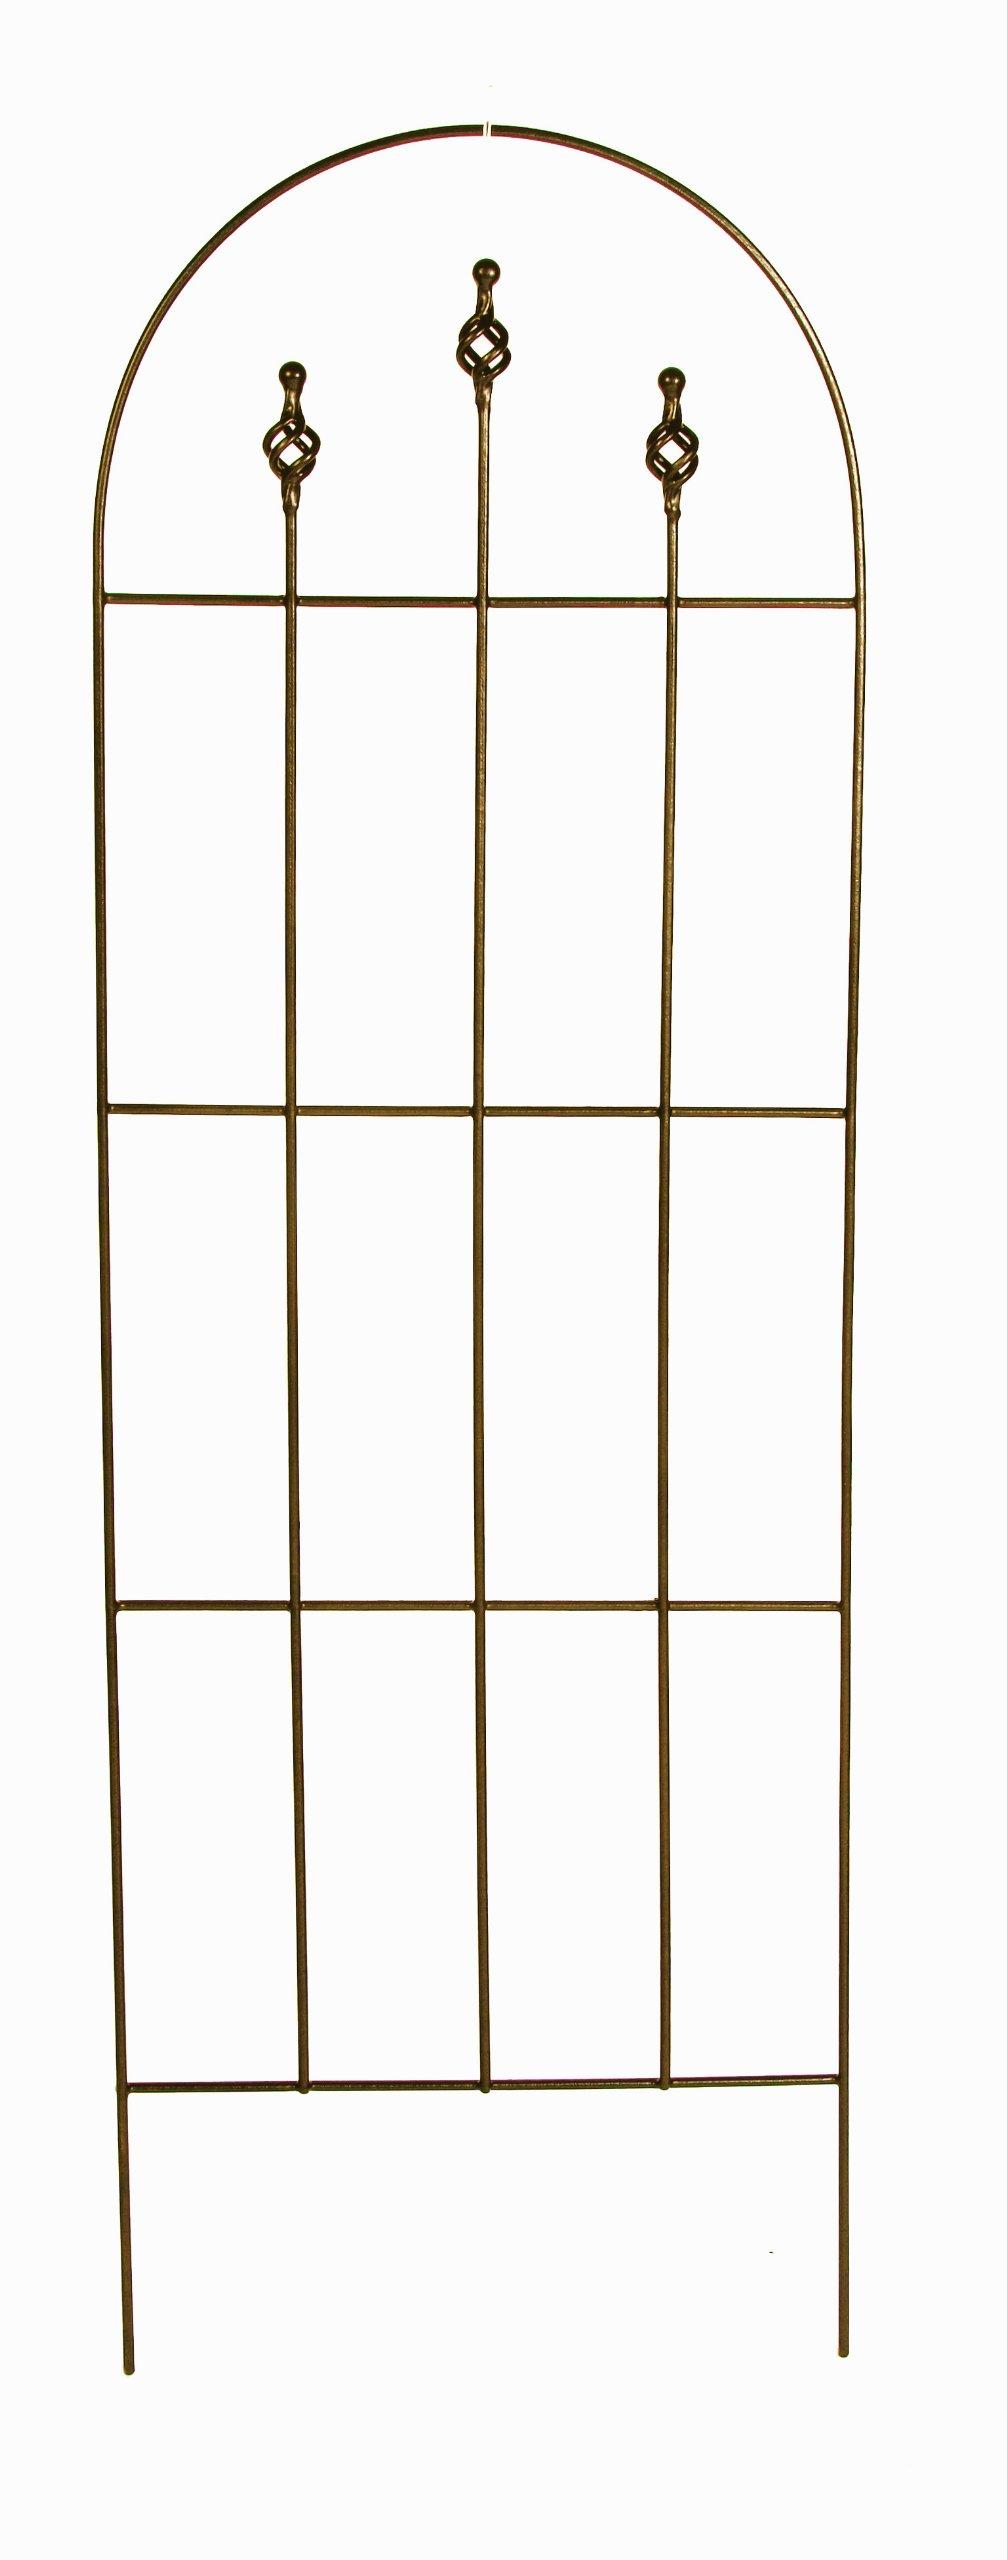 Gardman R552 Finial Trellis, Antique Copper Finish, 20'' Wide x 60'' High